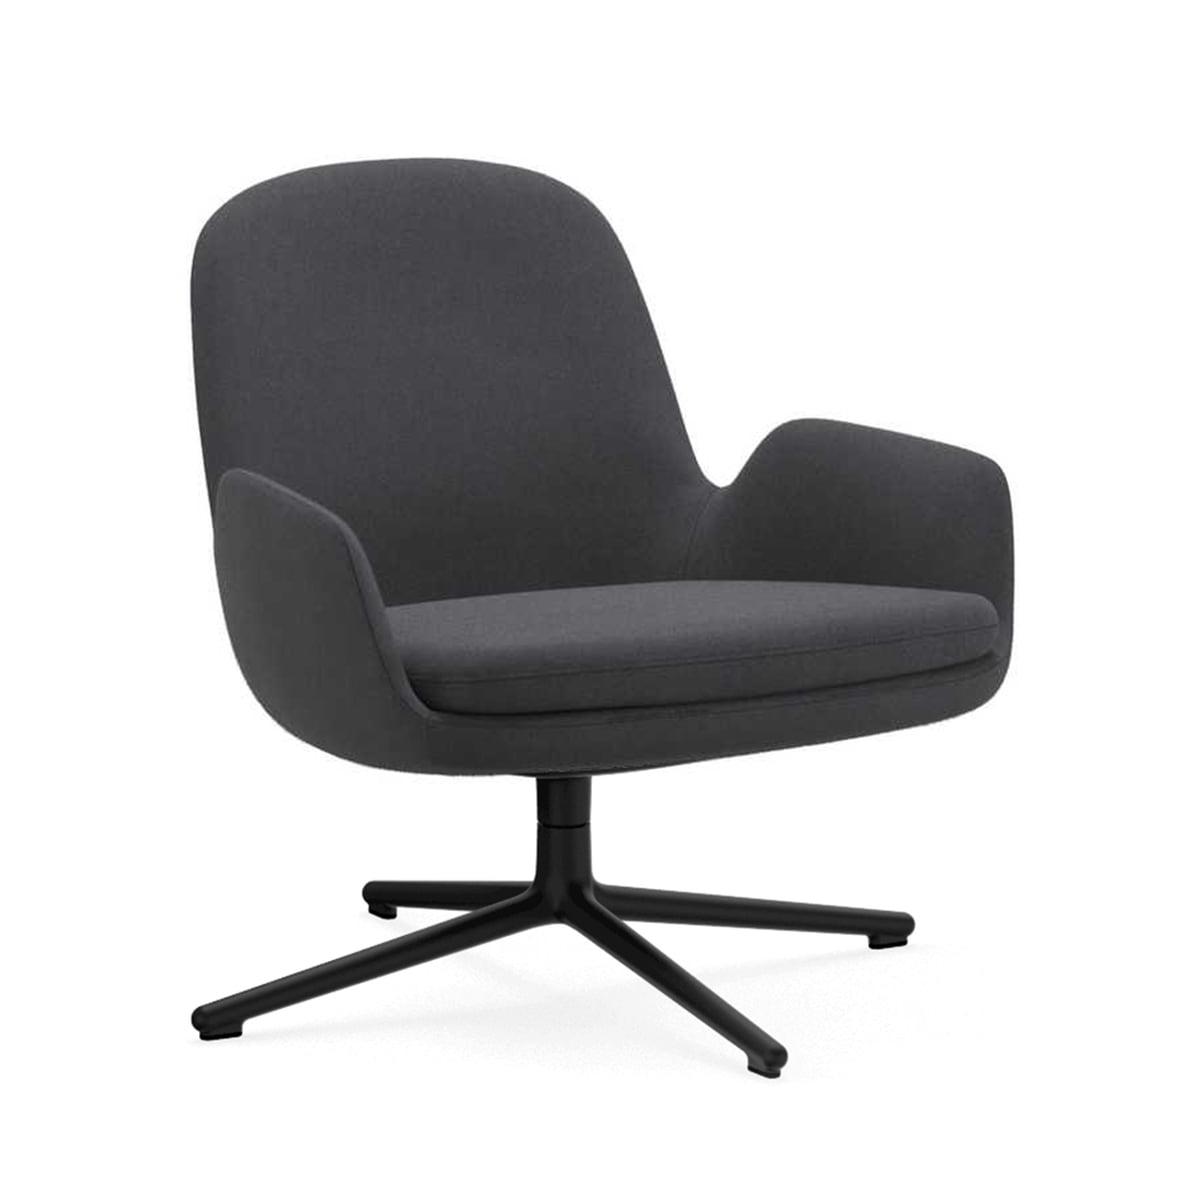 Era Lounge Chair Metal By Normann Copenhagen Connox